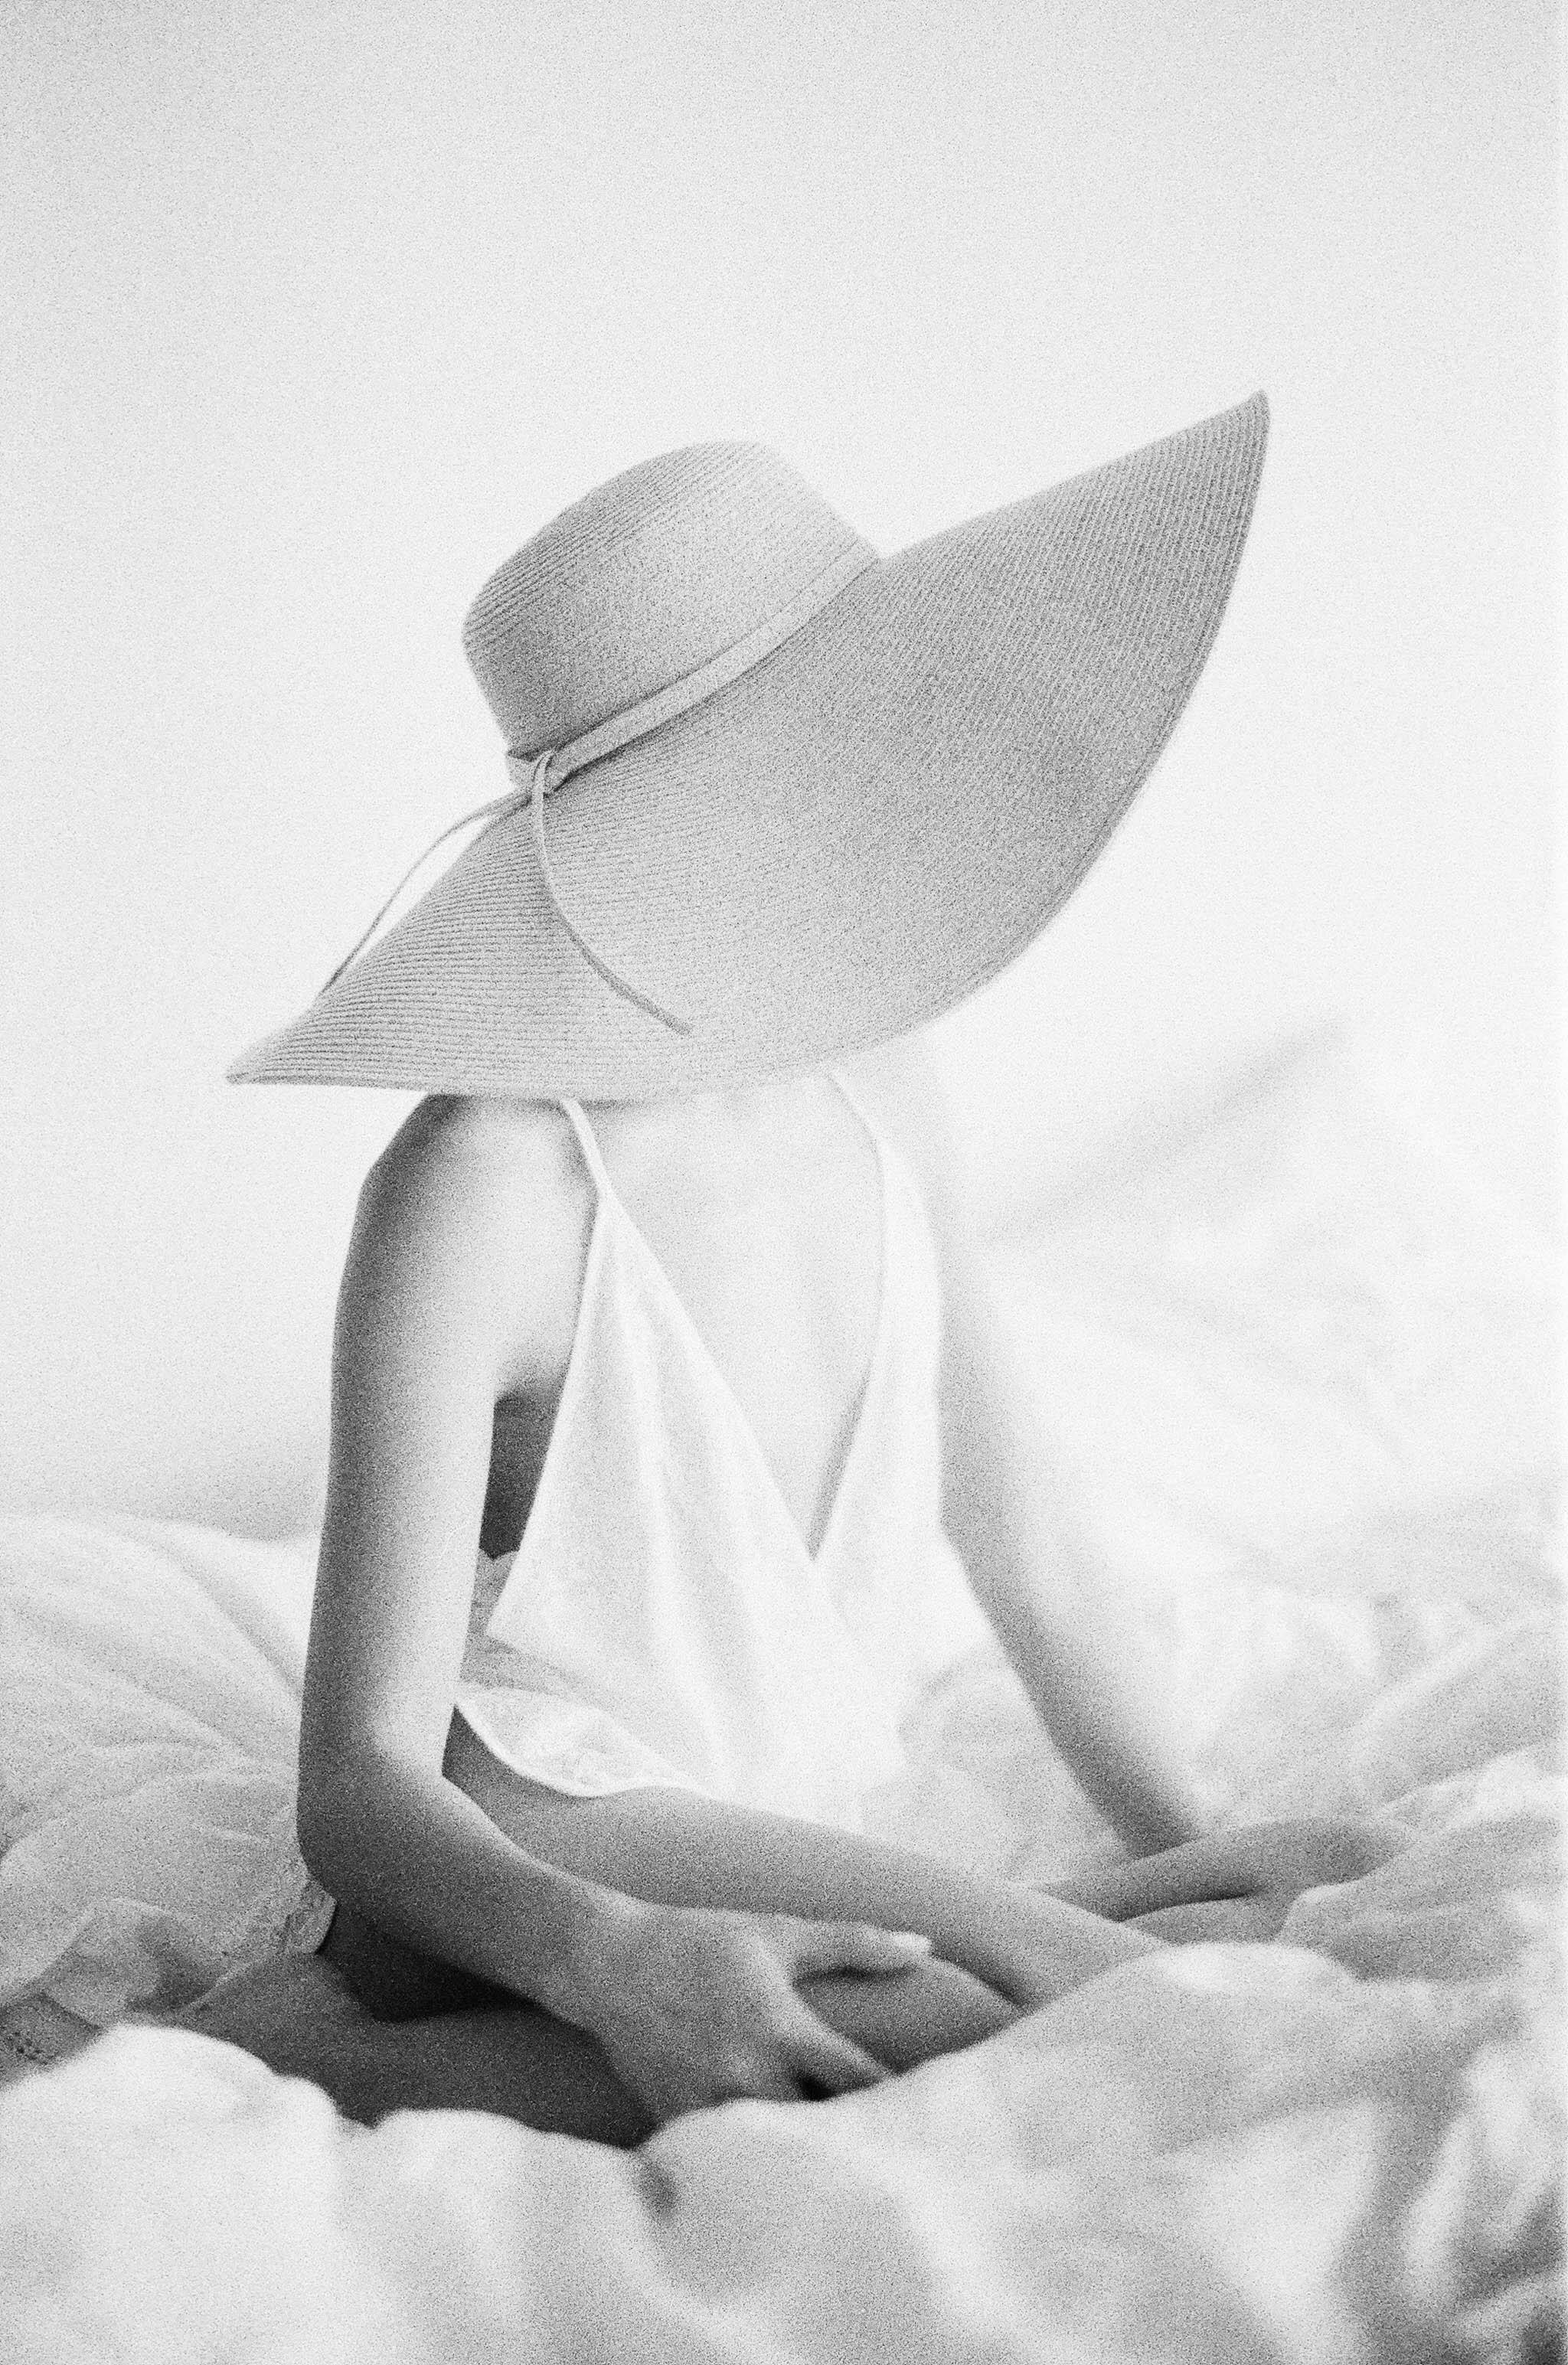 Veronique - Natural Boudoir SeriesChiali Meng ArtistryGirl and a Serious DreamBHLDN